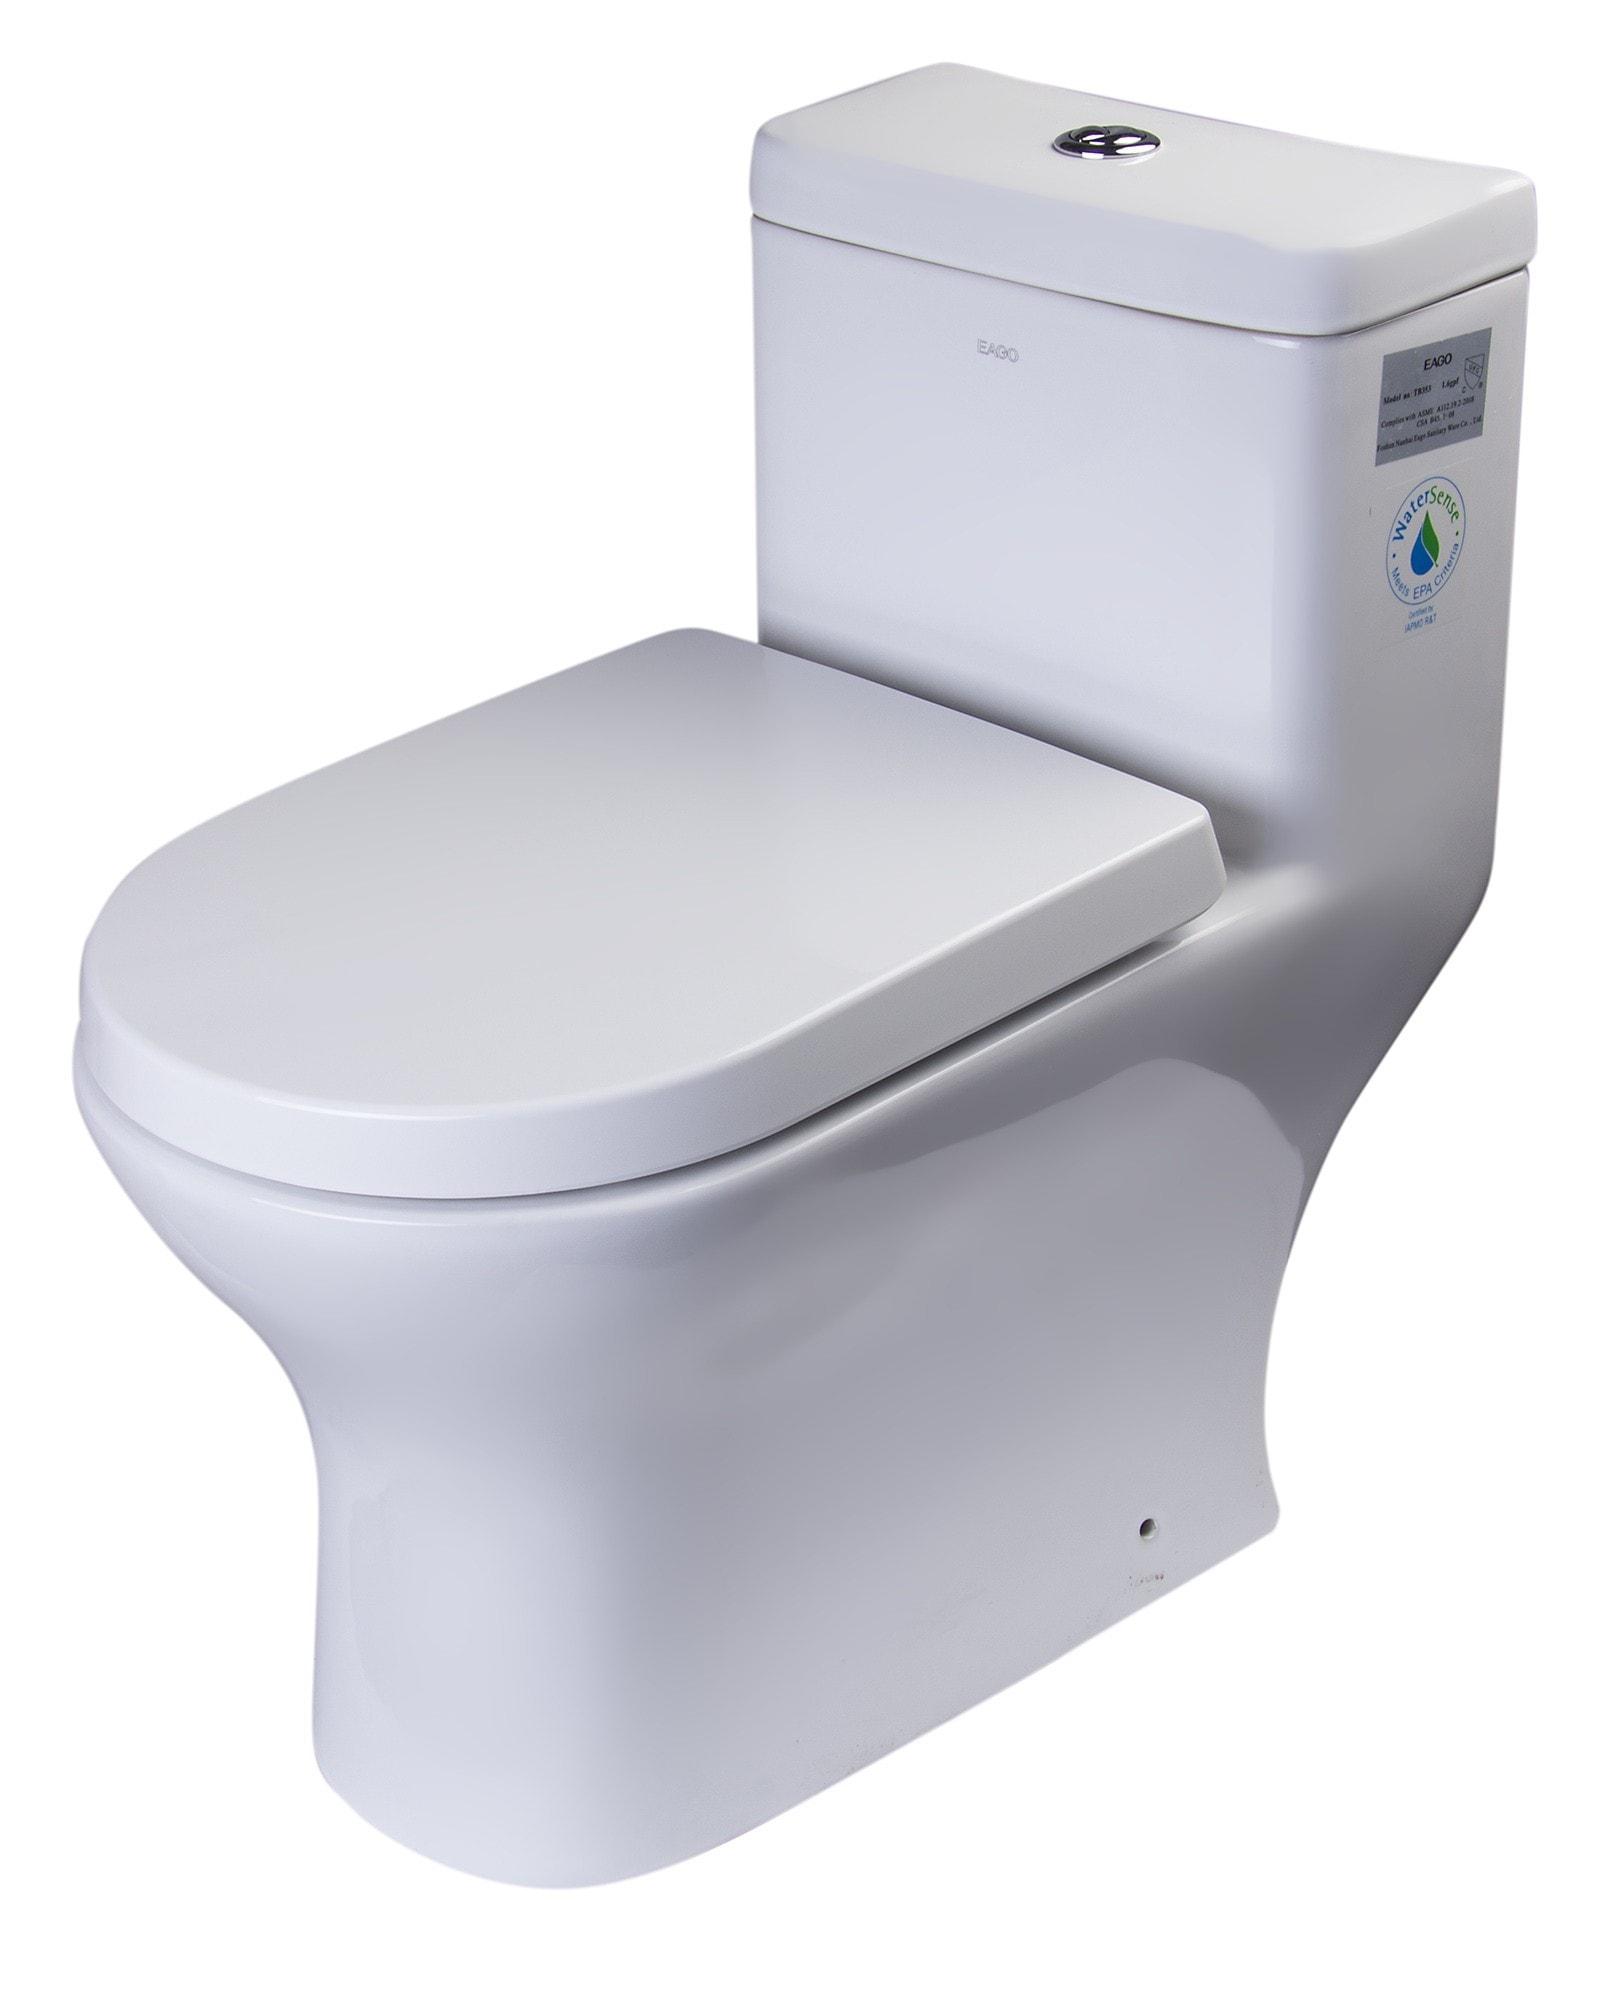 One Piece Elongated Toilet / White / Elongated / Dual flush (0.8gpf / 1.6gpf) / 26 3/4 x 14 1/8 x 27 1/8 / TB353 TB353 Dual Flush Eco-Friendly High Efficiency Low Flush Toilet 0